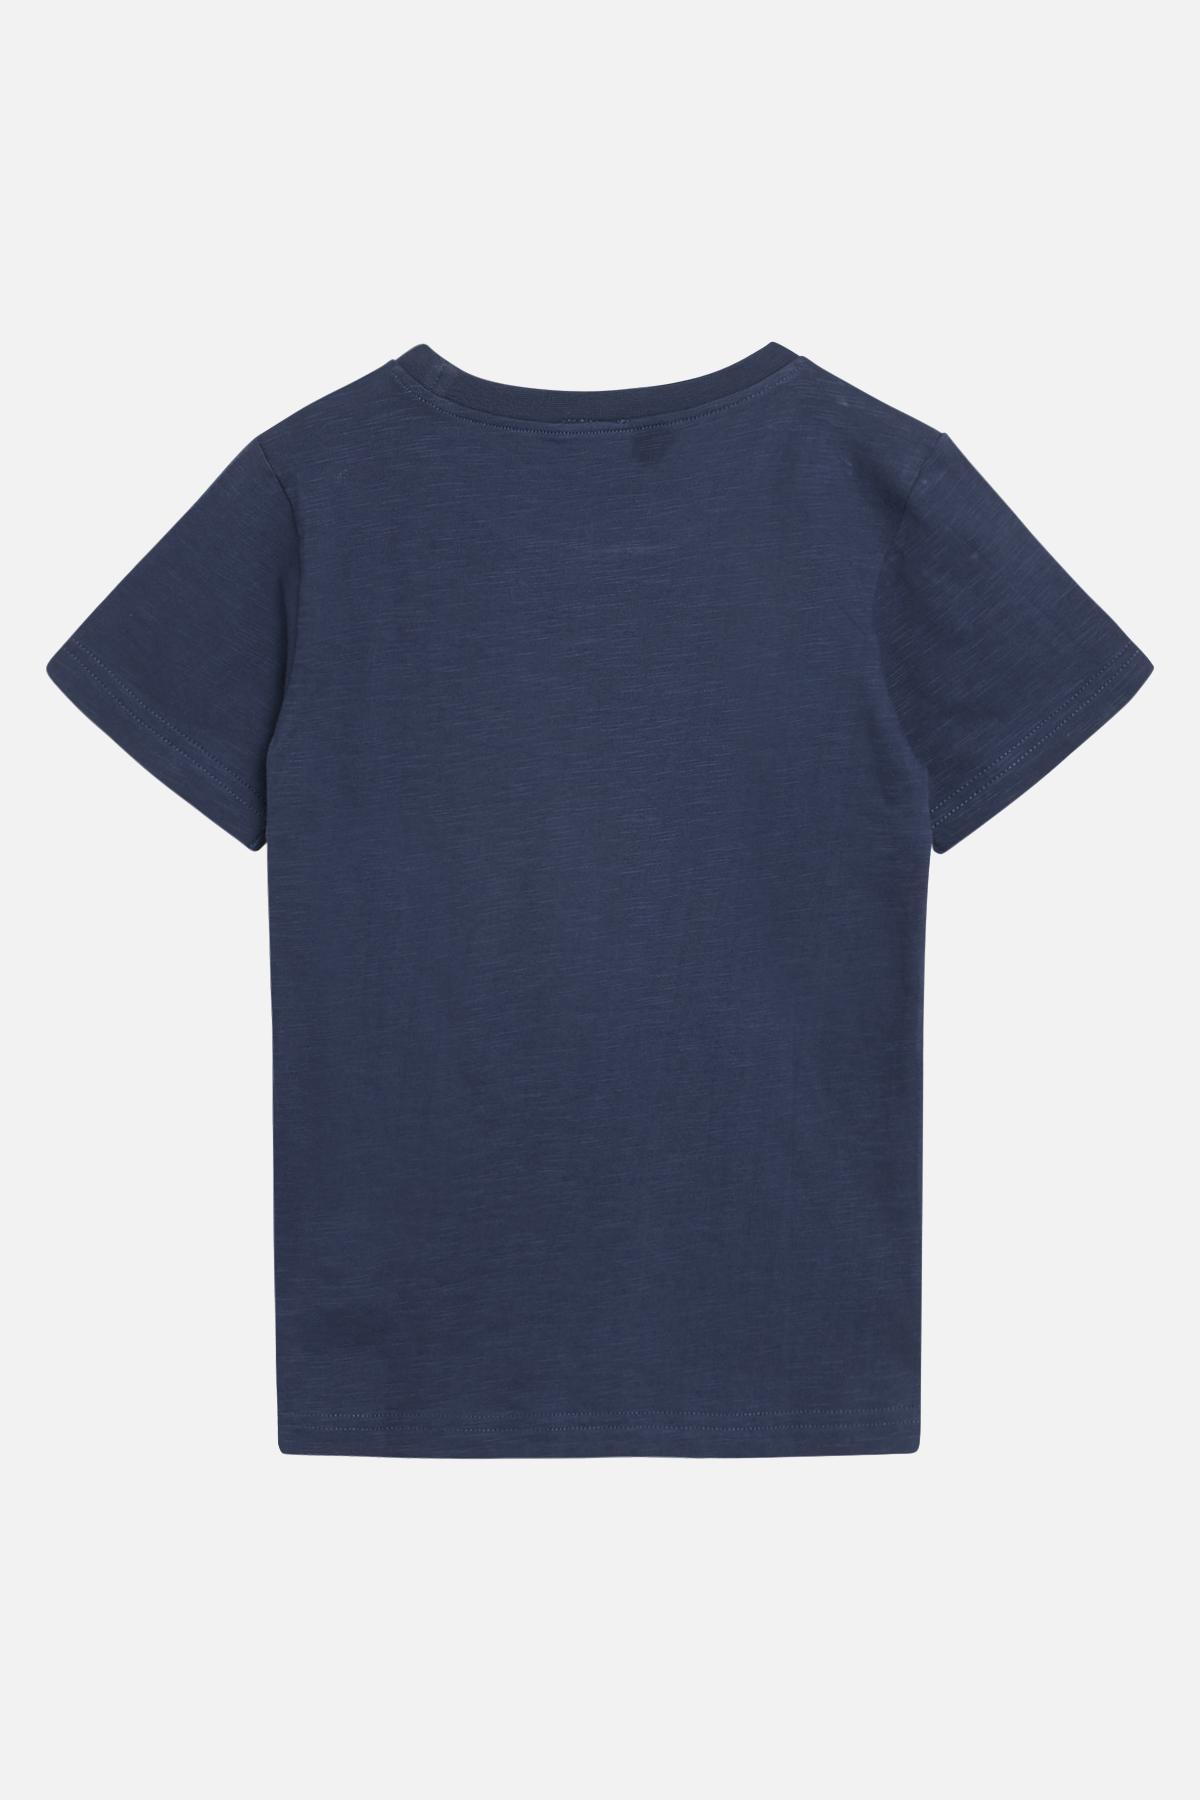 Boy - Alwin - T-shirt